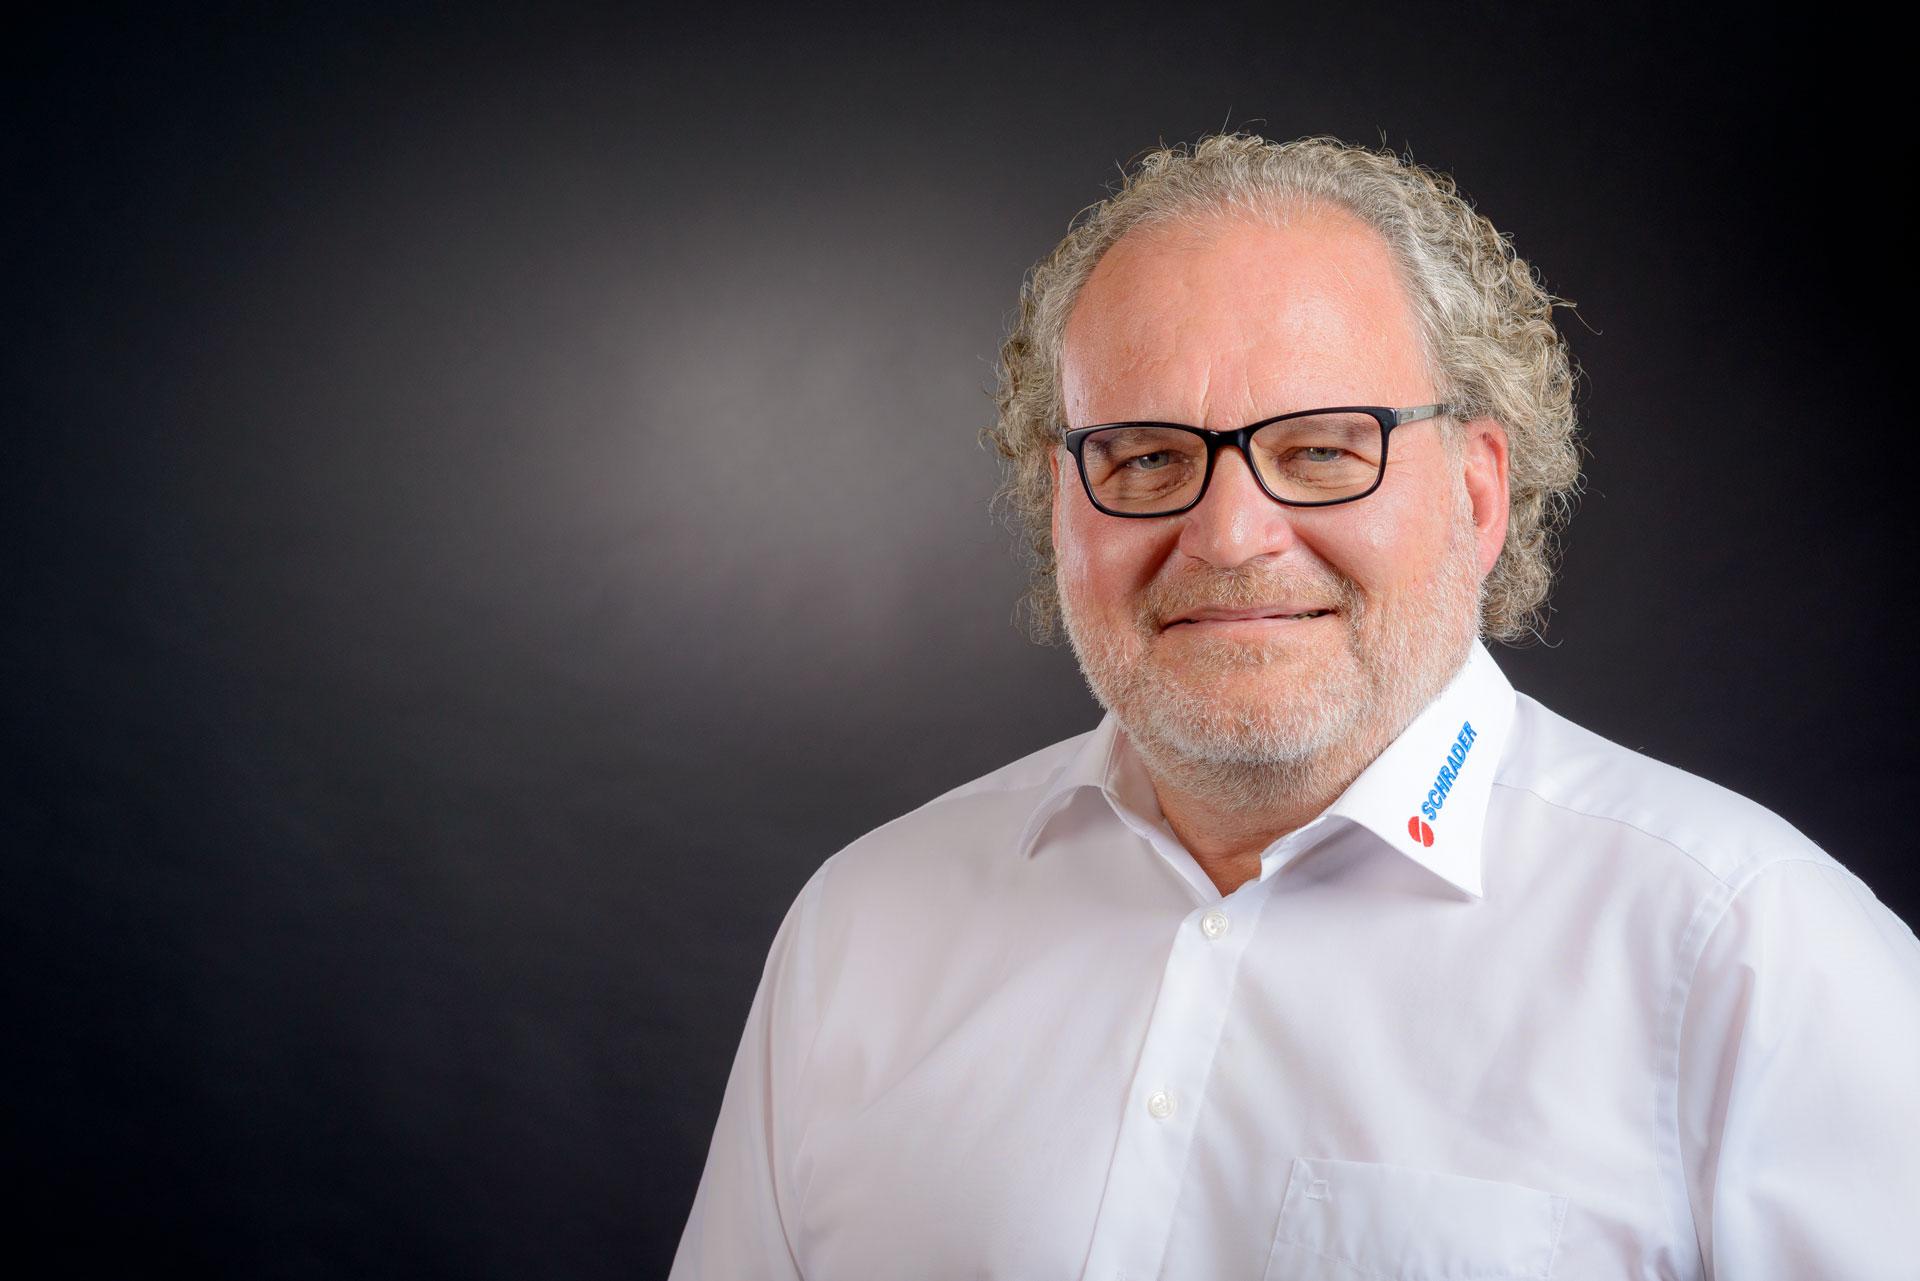 Michael-Brackmann